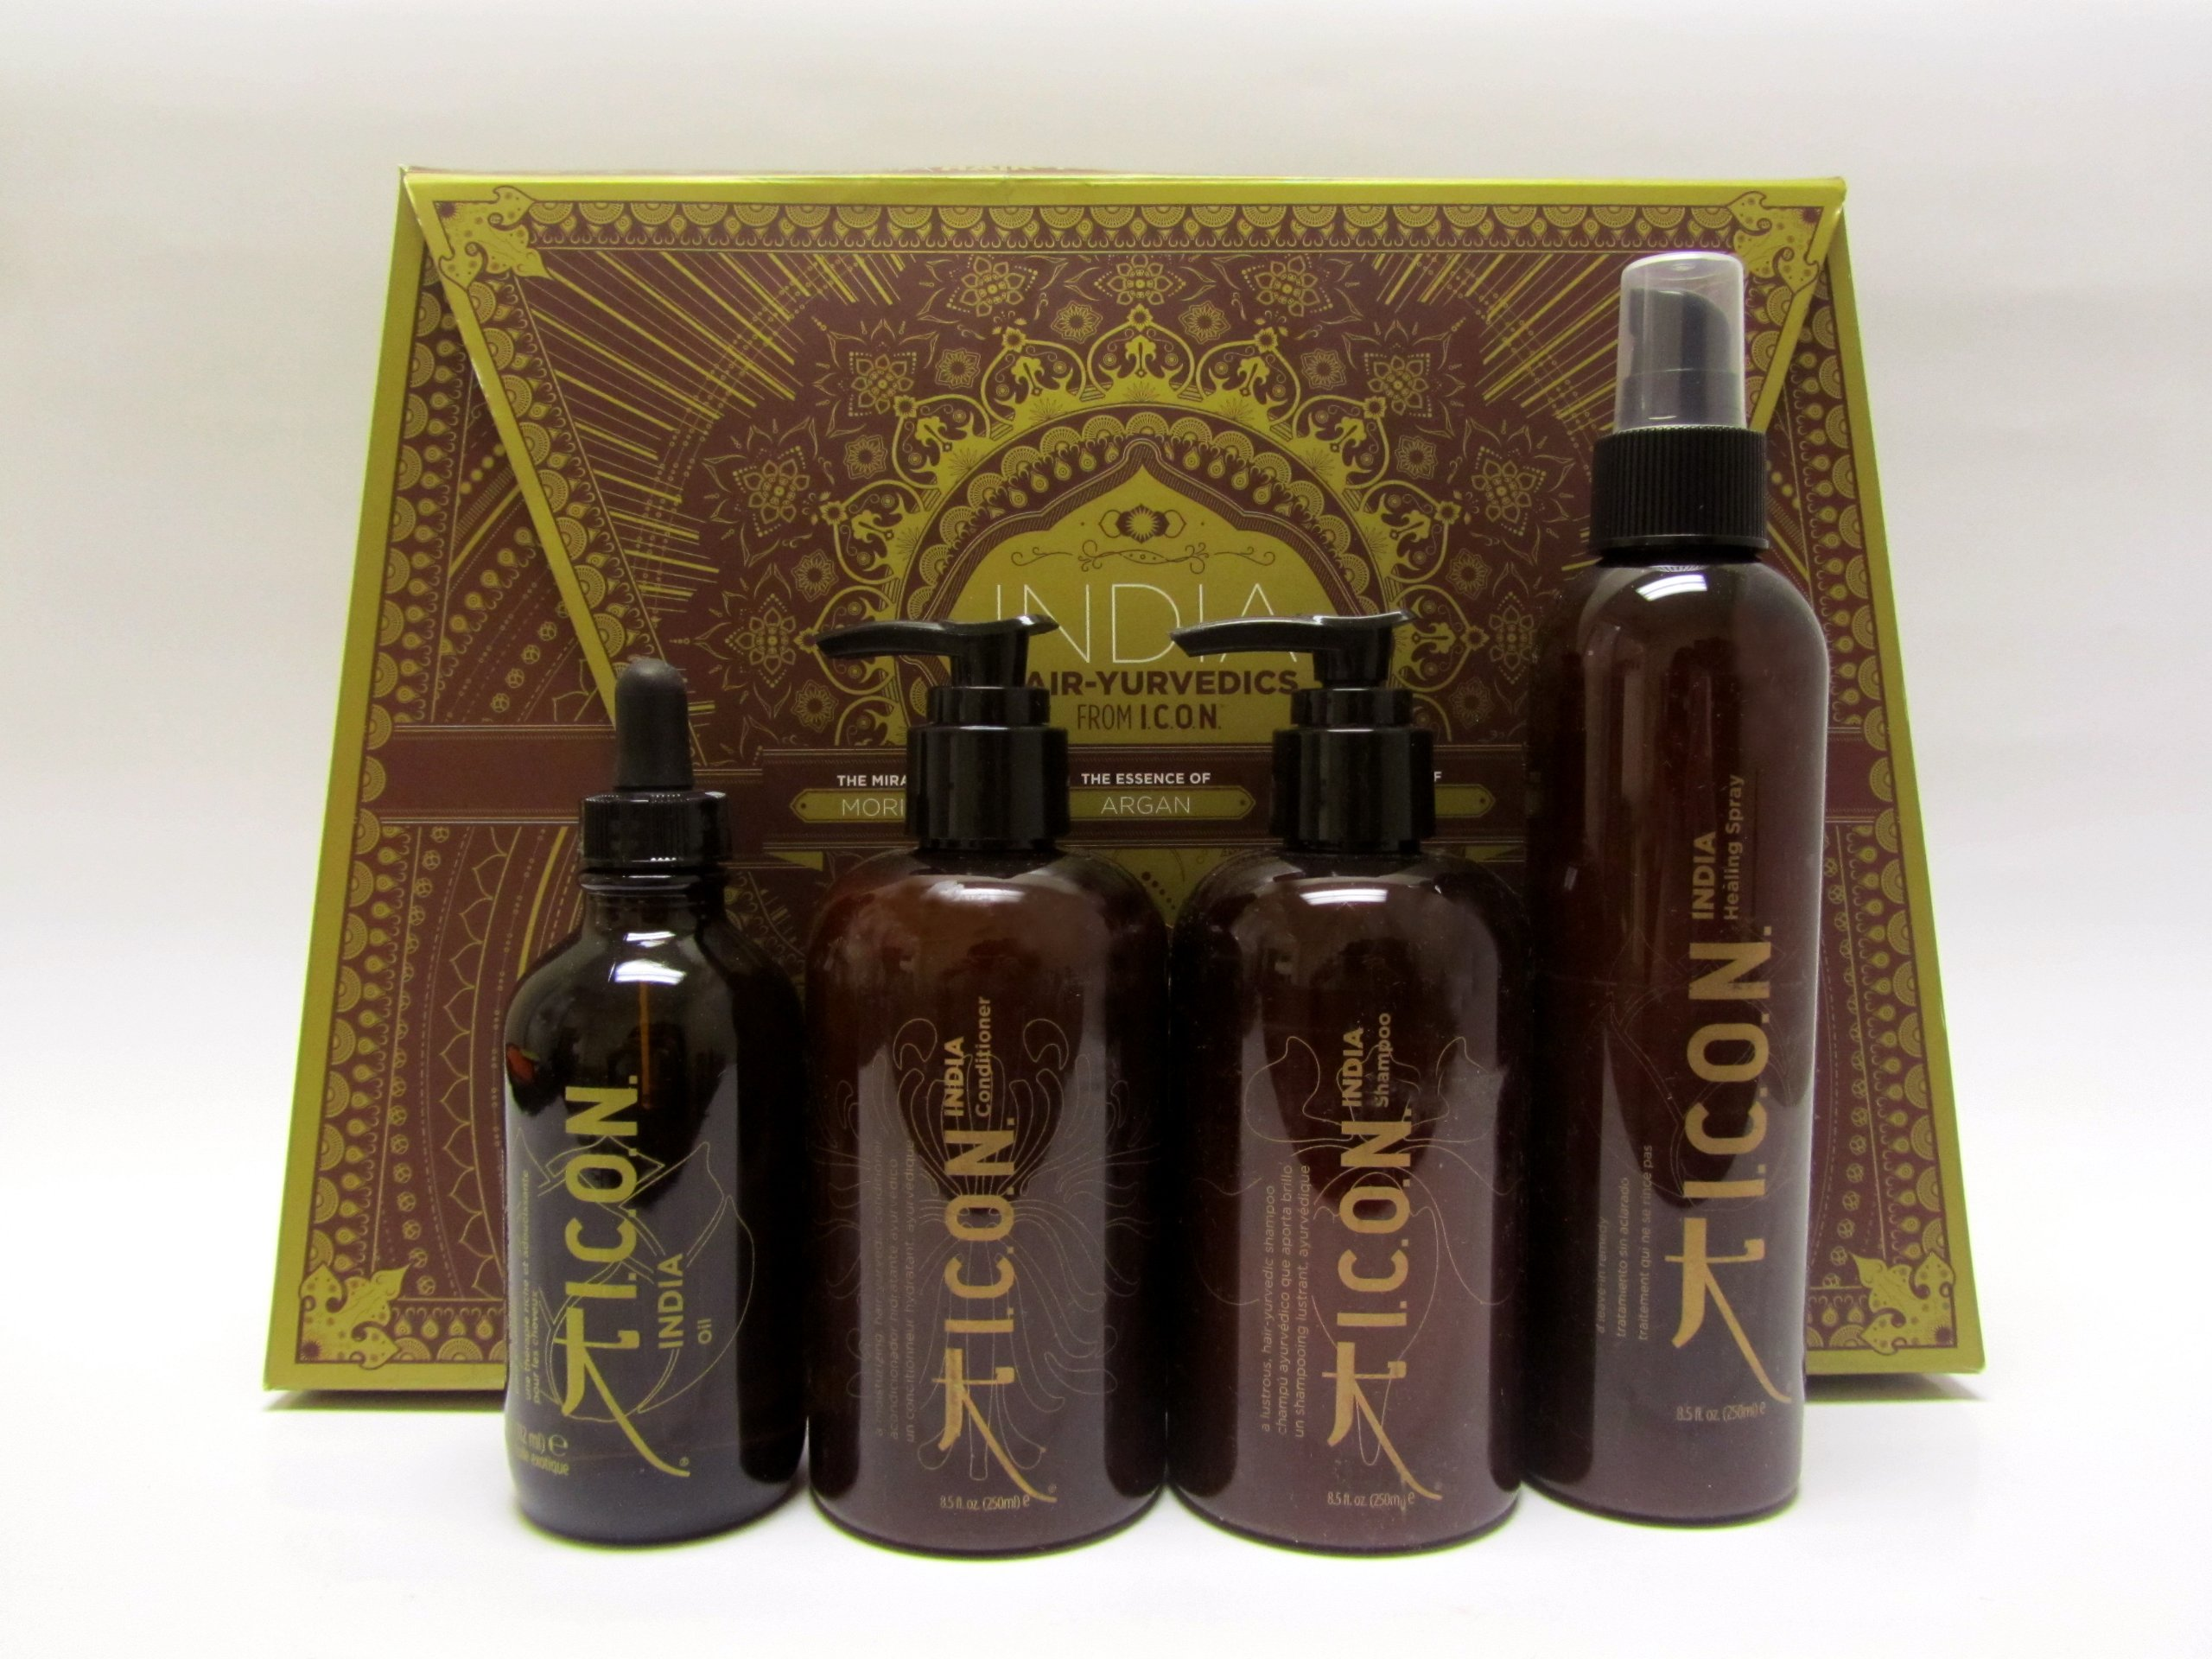 ICON INDIA Hair Care Four Set(India Oil, Shampoo, Conditioner, Healing Spray)